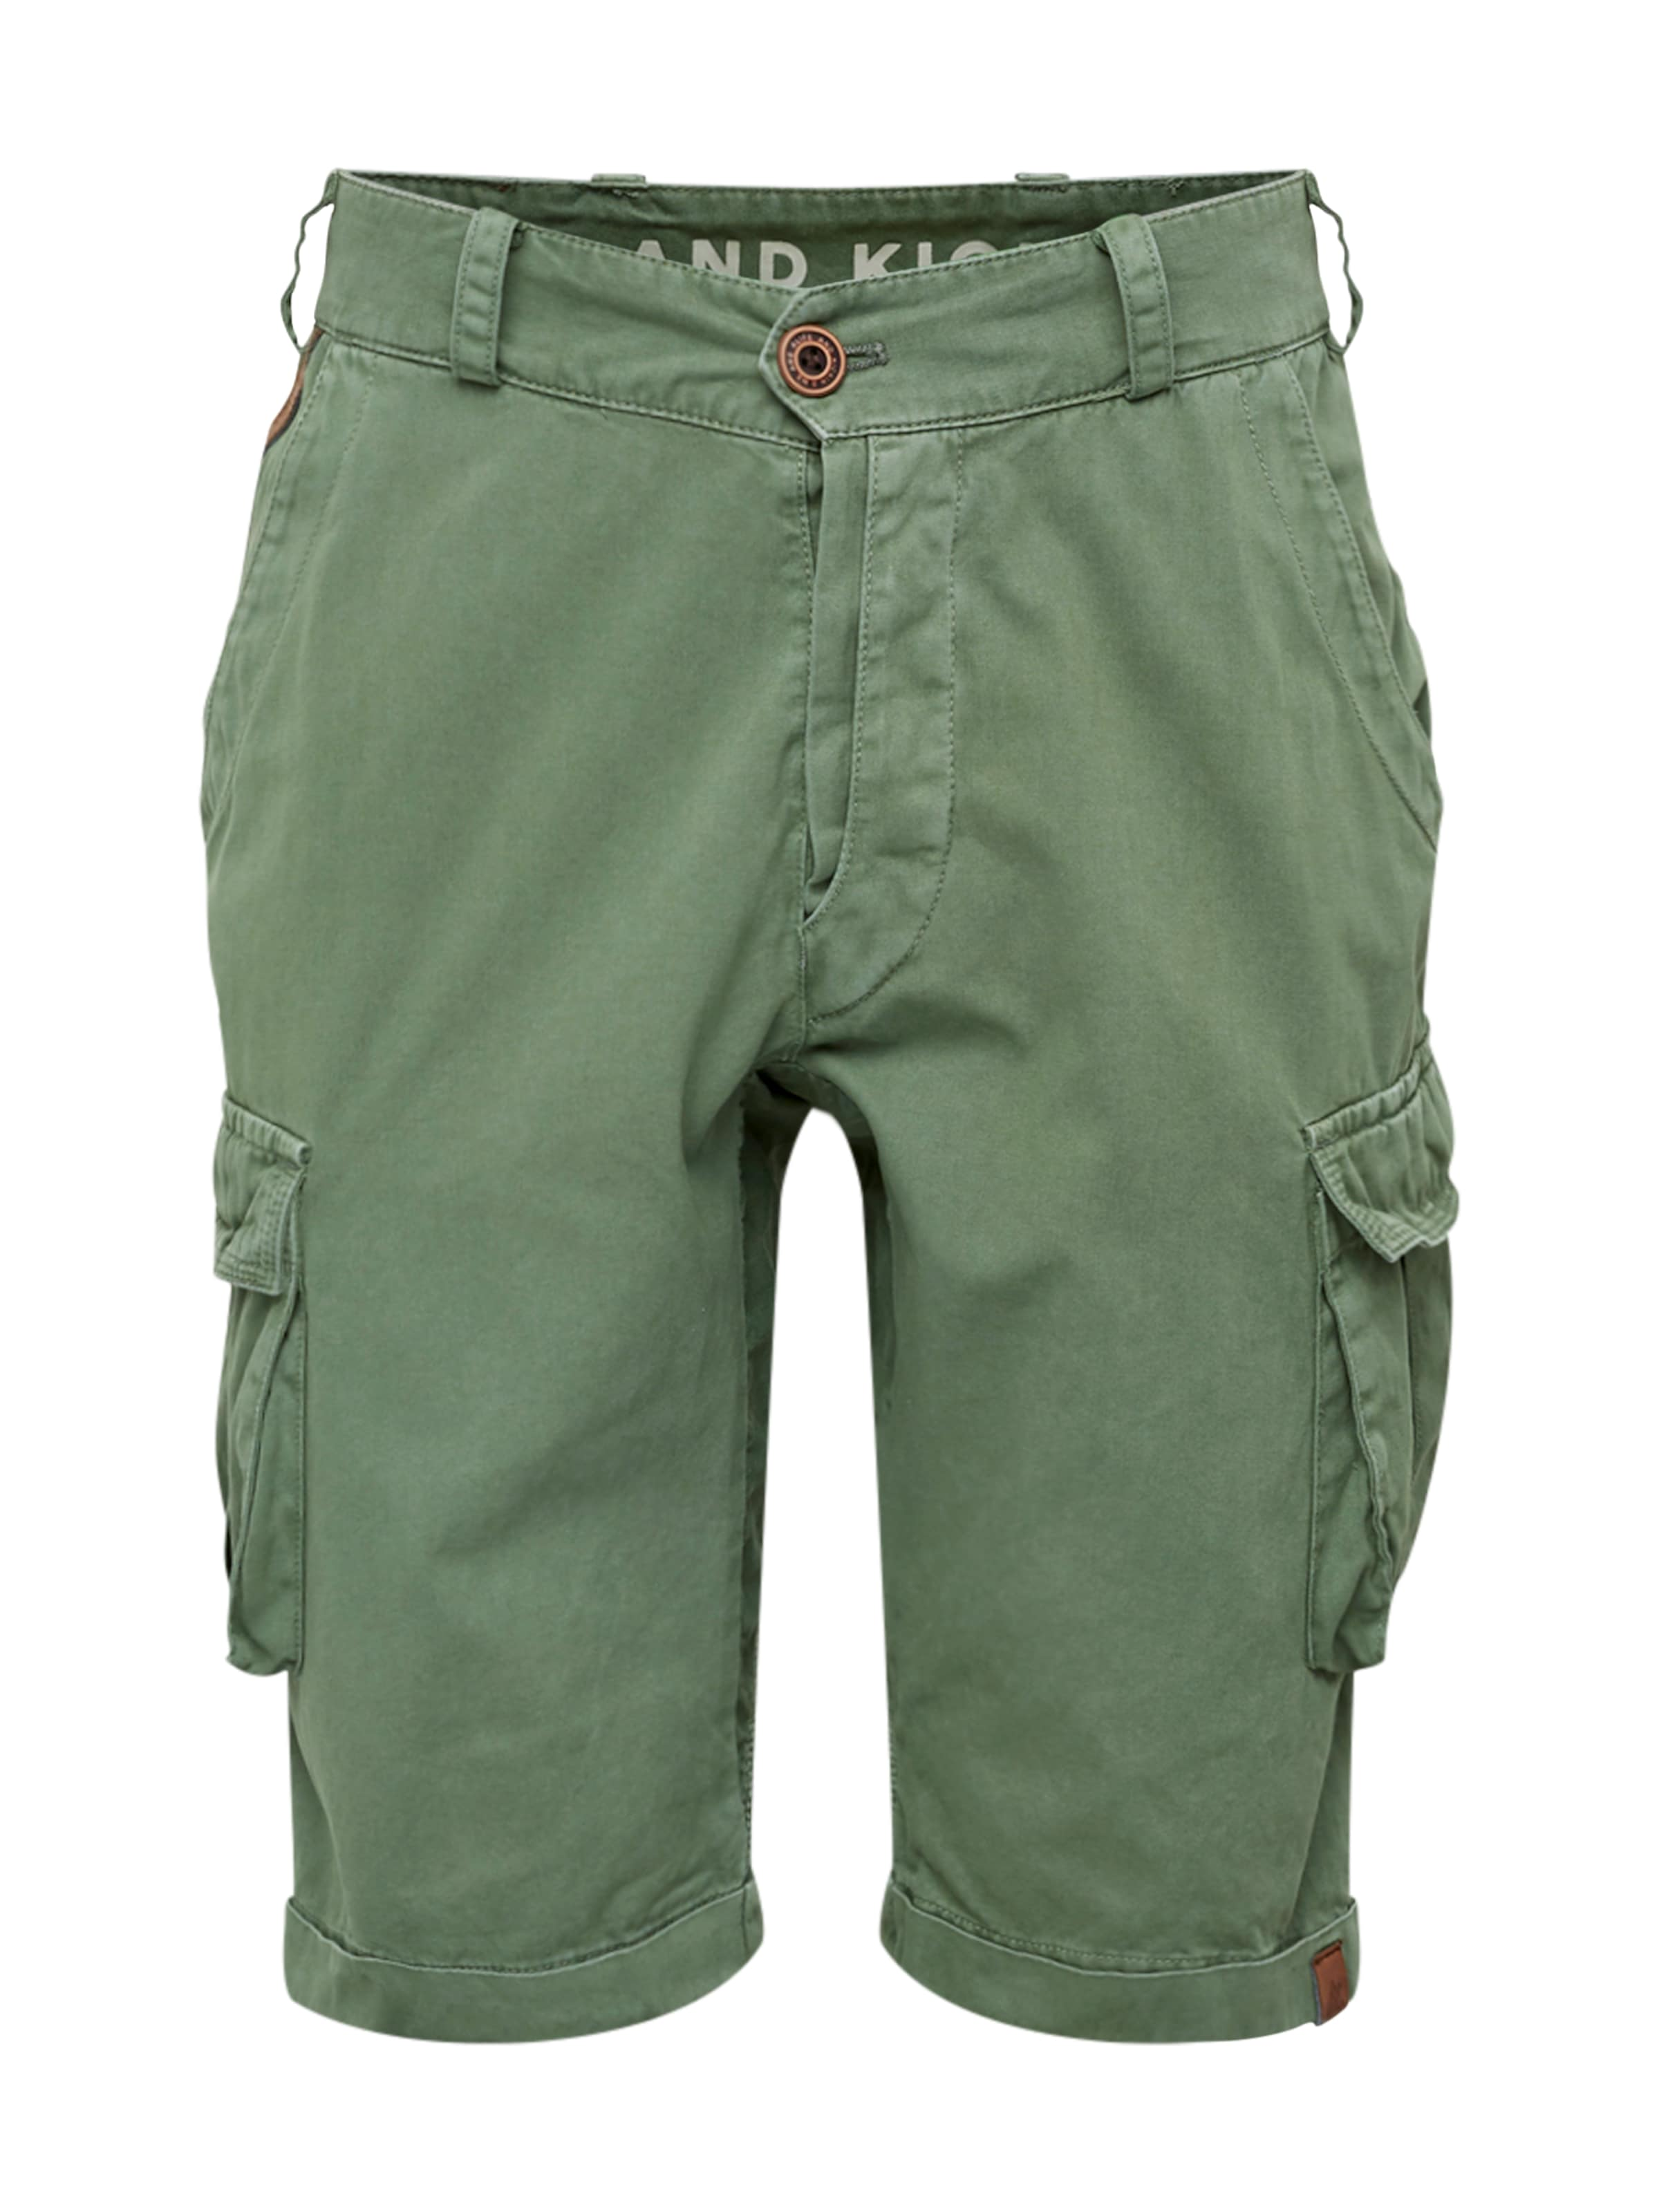 Alife And 'philippe' Kickin Grün Shorts In DHW2YE9I